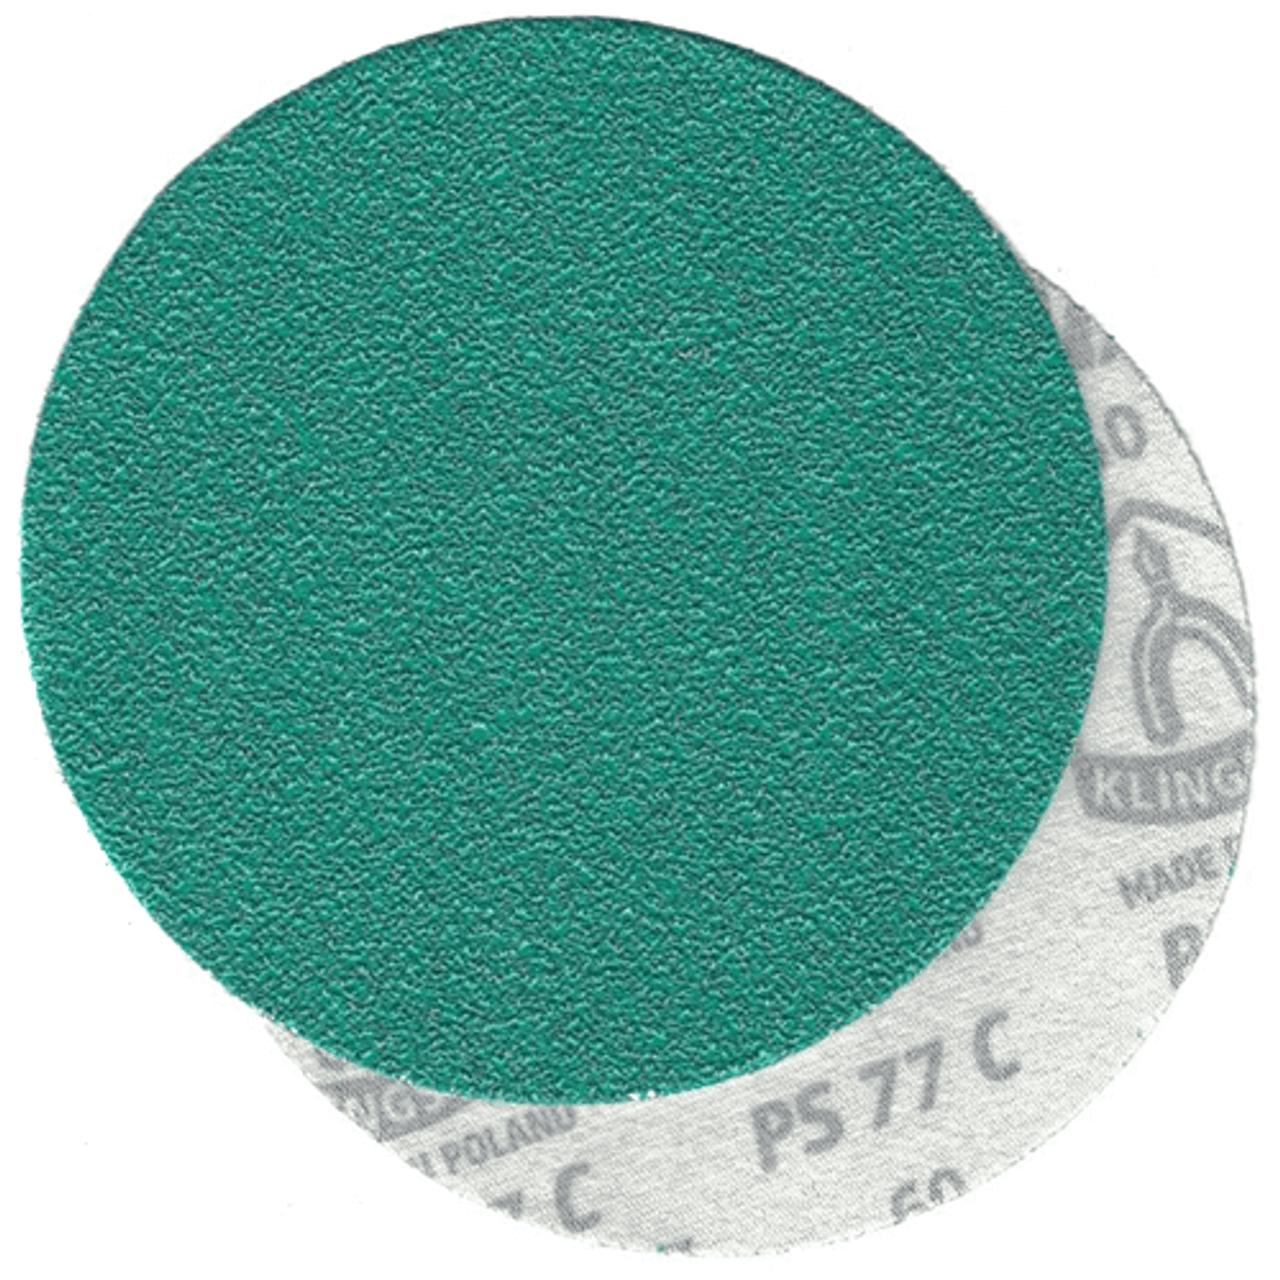 Klingspor Abrasives GreenTec 11 Inch H&L 220 Grit Disc 5pk